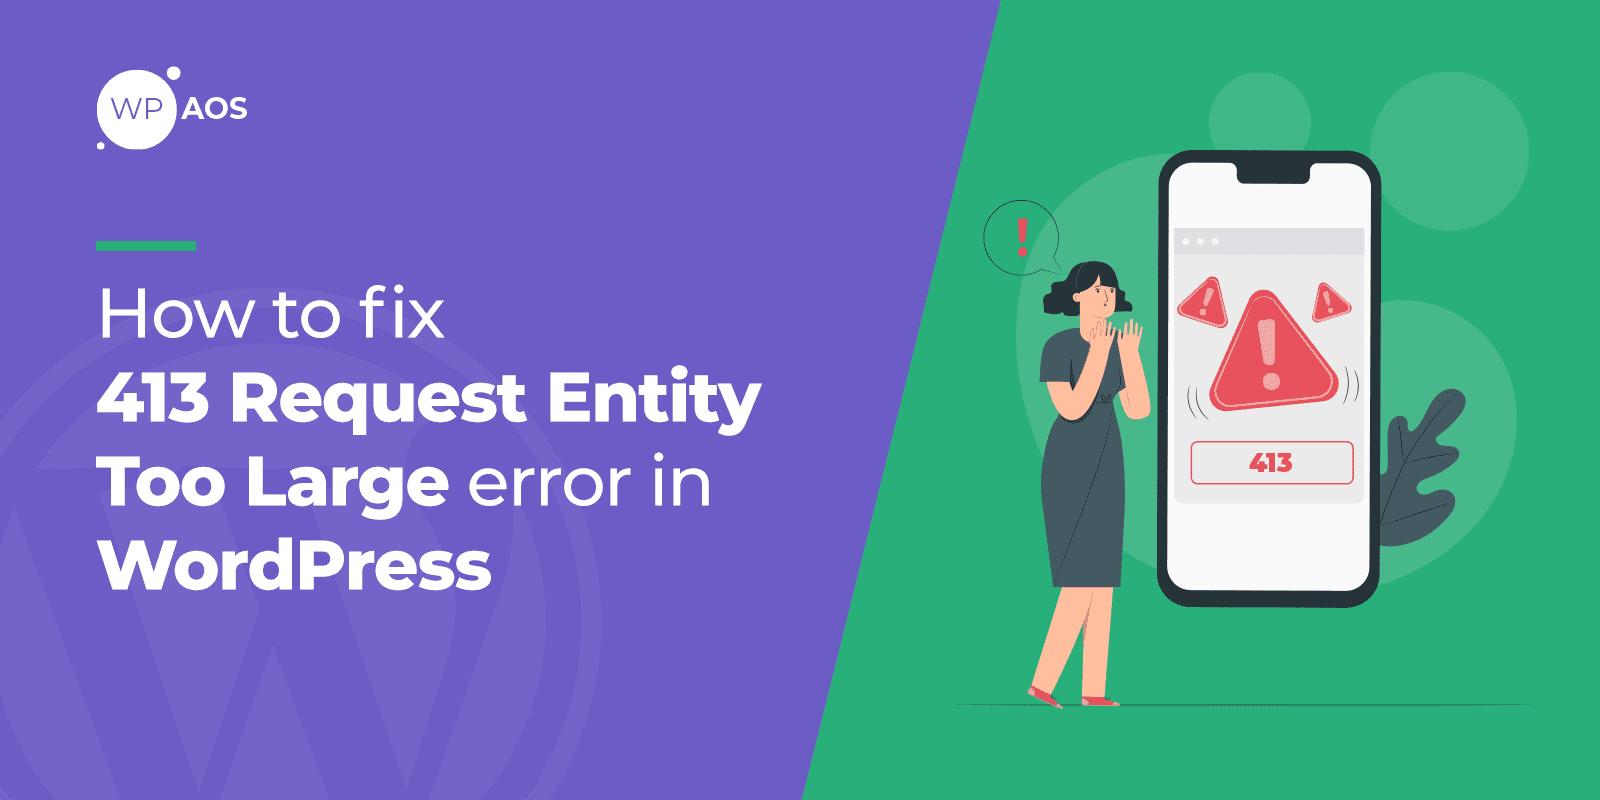 How to Fix 413 Error, WordPress support, wpaos